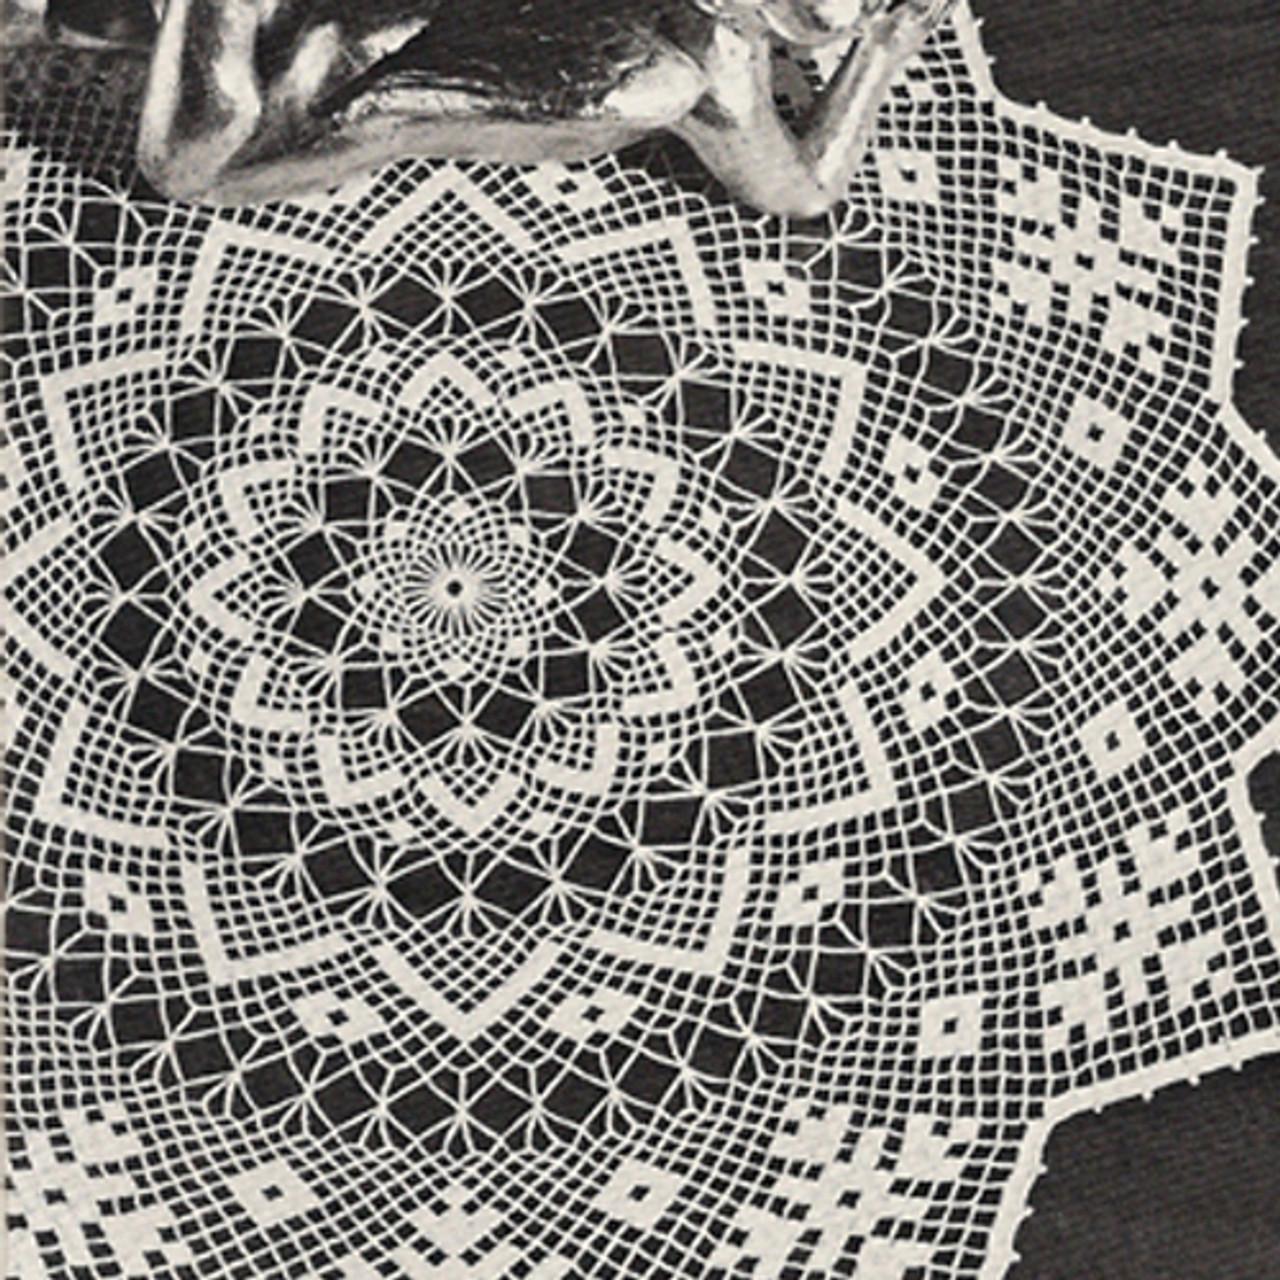 Centerpiece in Crocheted Netting Doily Pattern